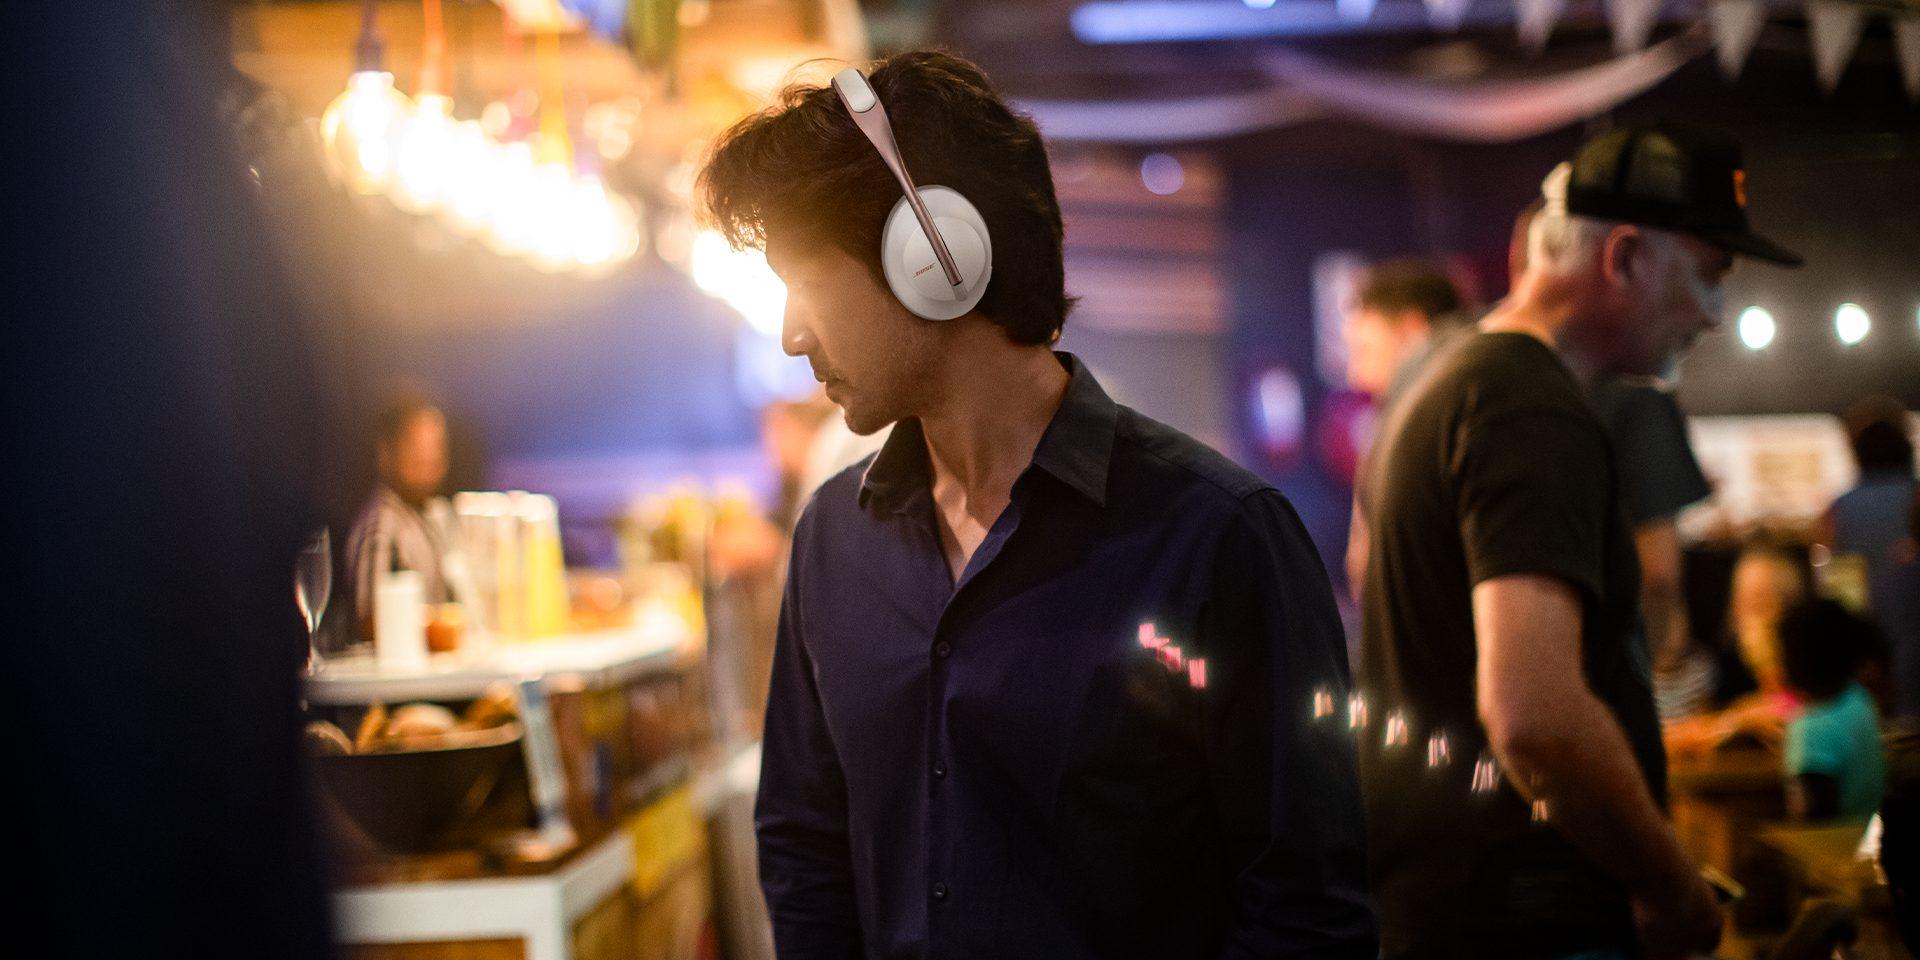 Bose Headphones 700 Boom Headset specifications